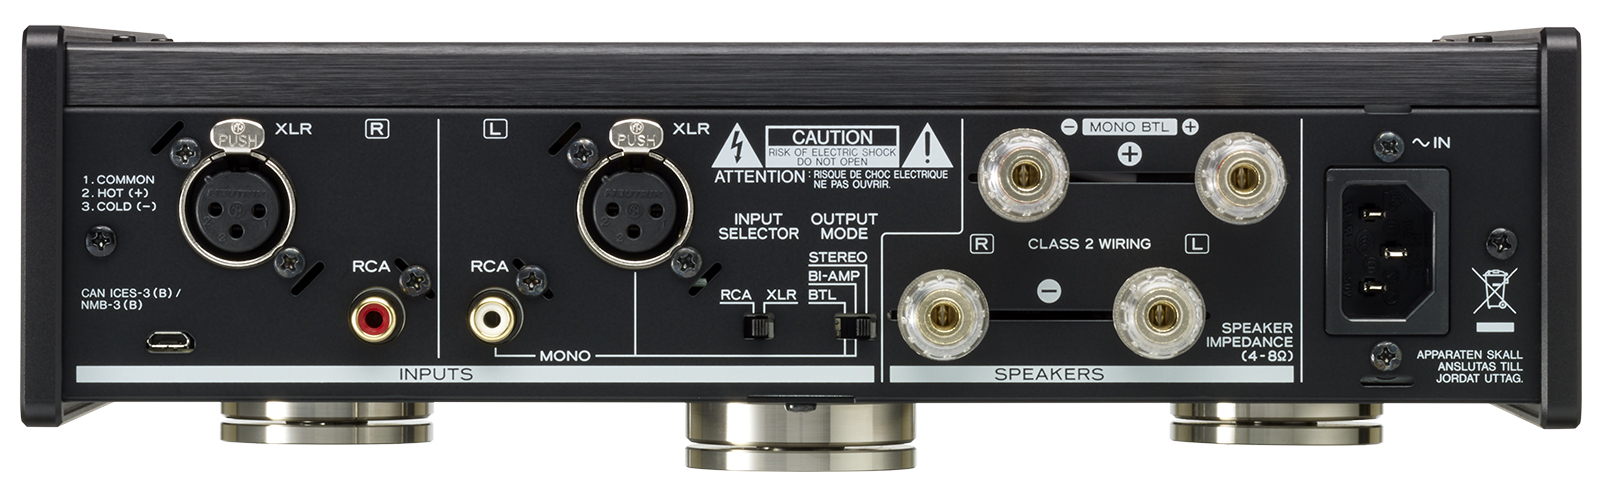 AP-505